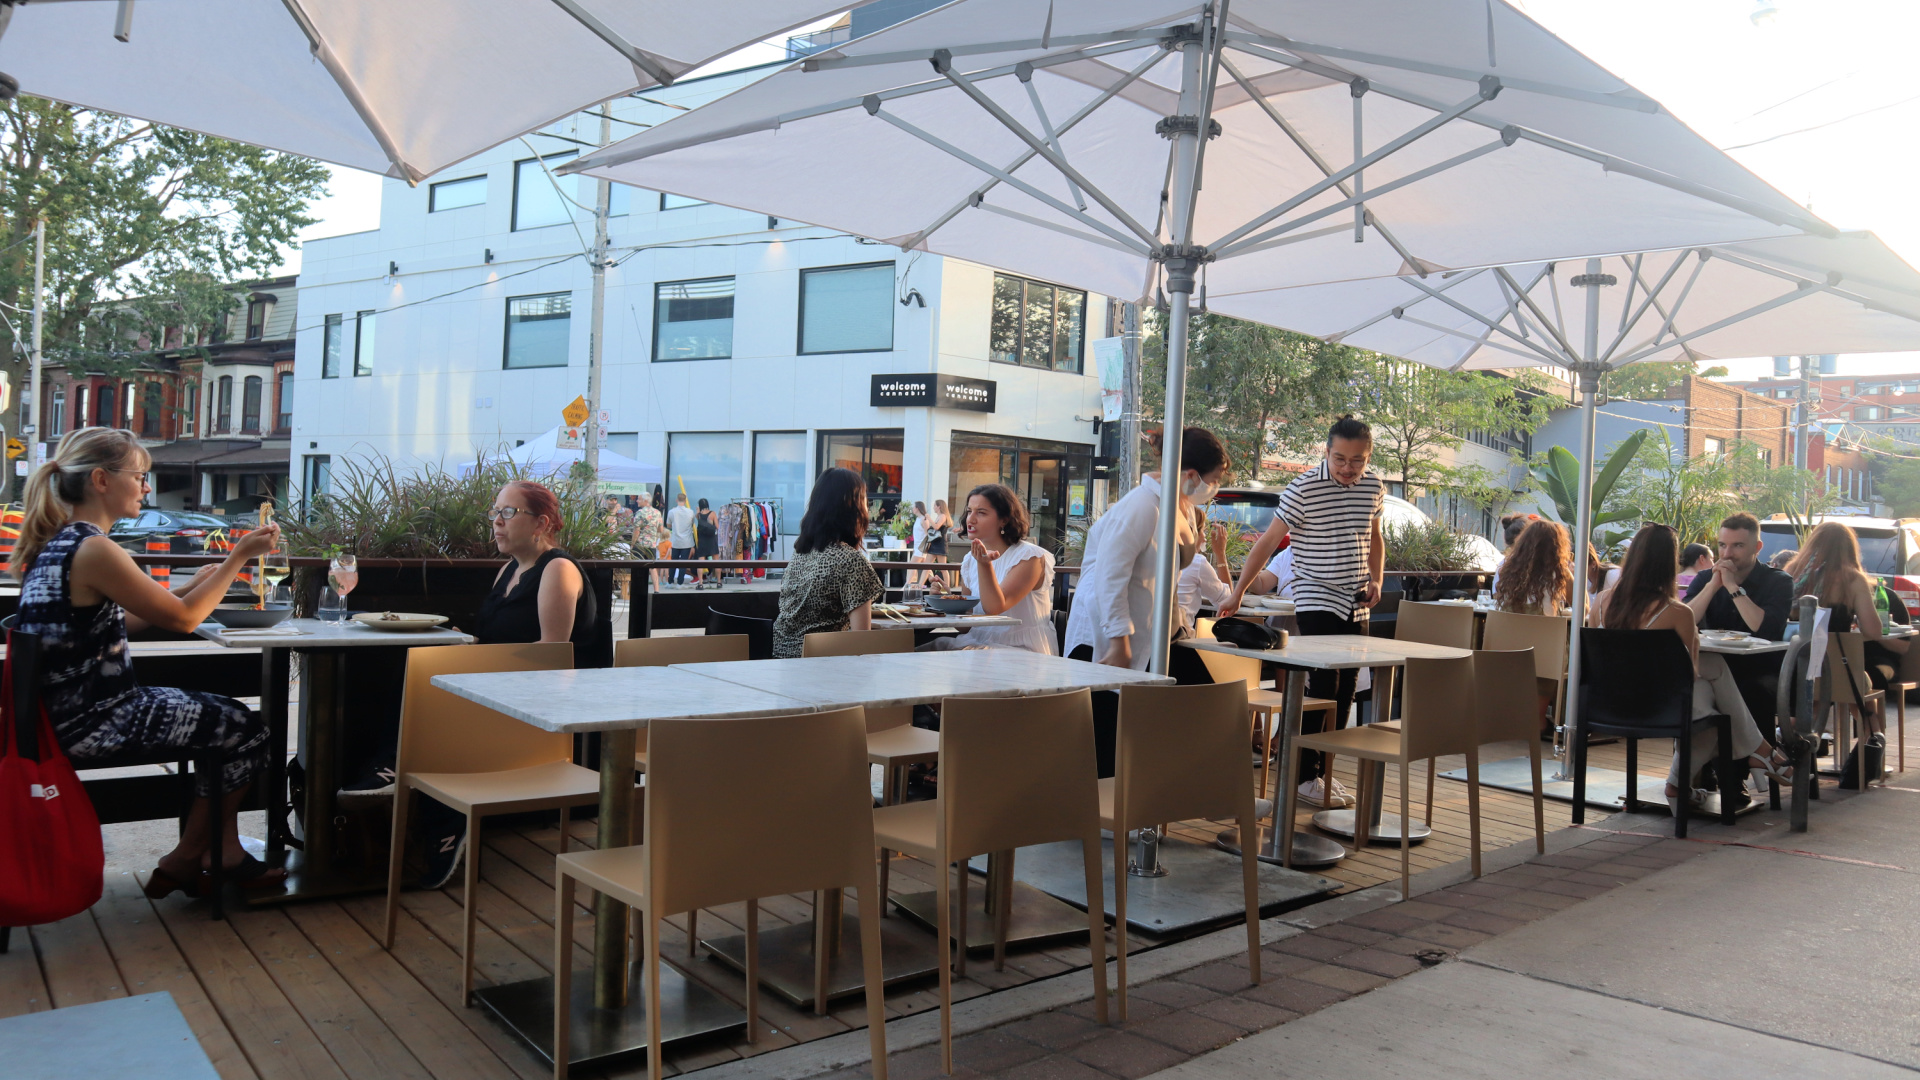 gia restaurant patio